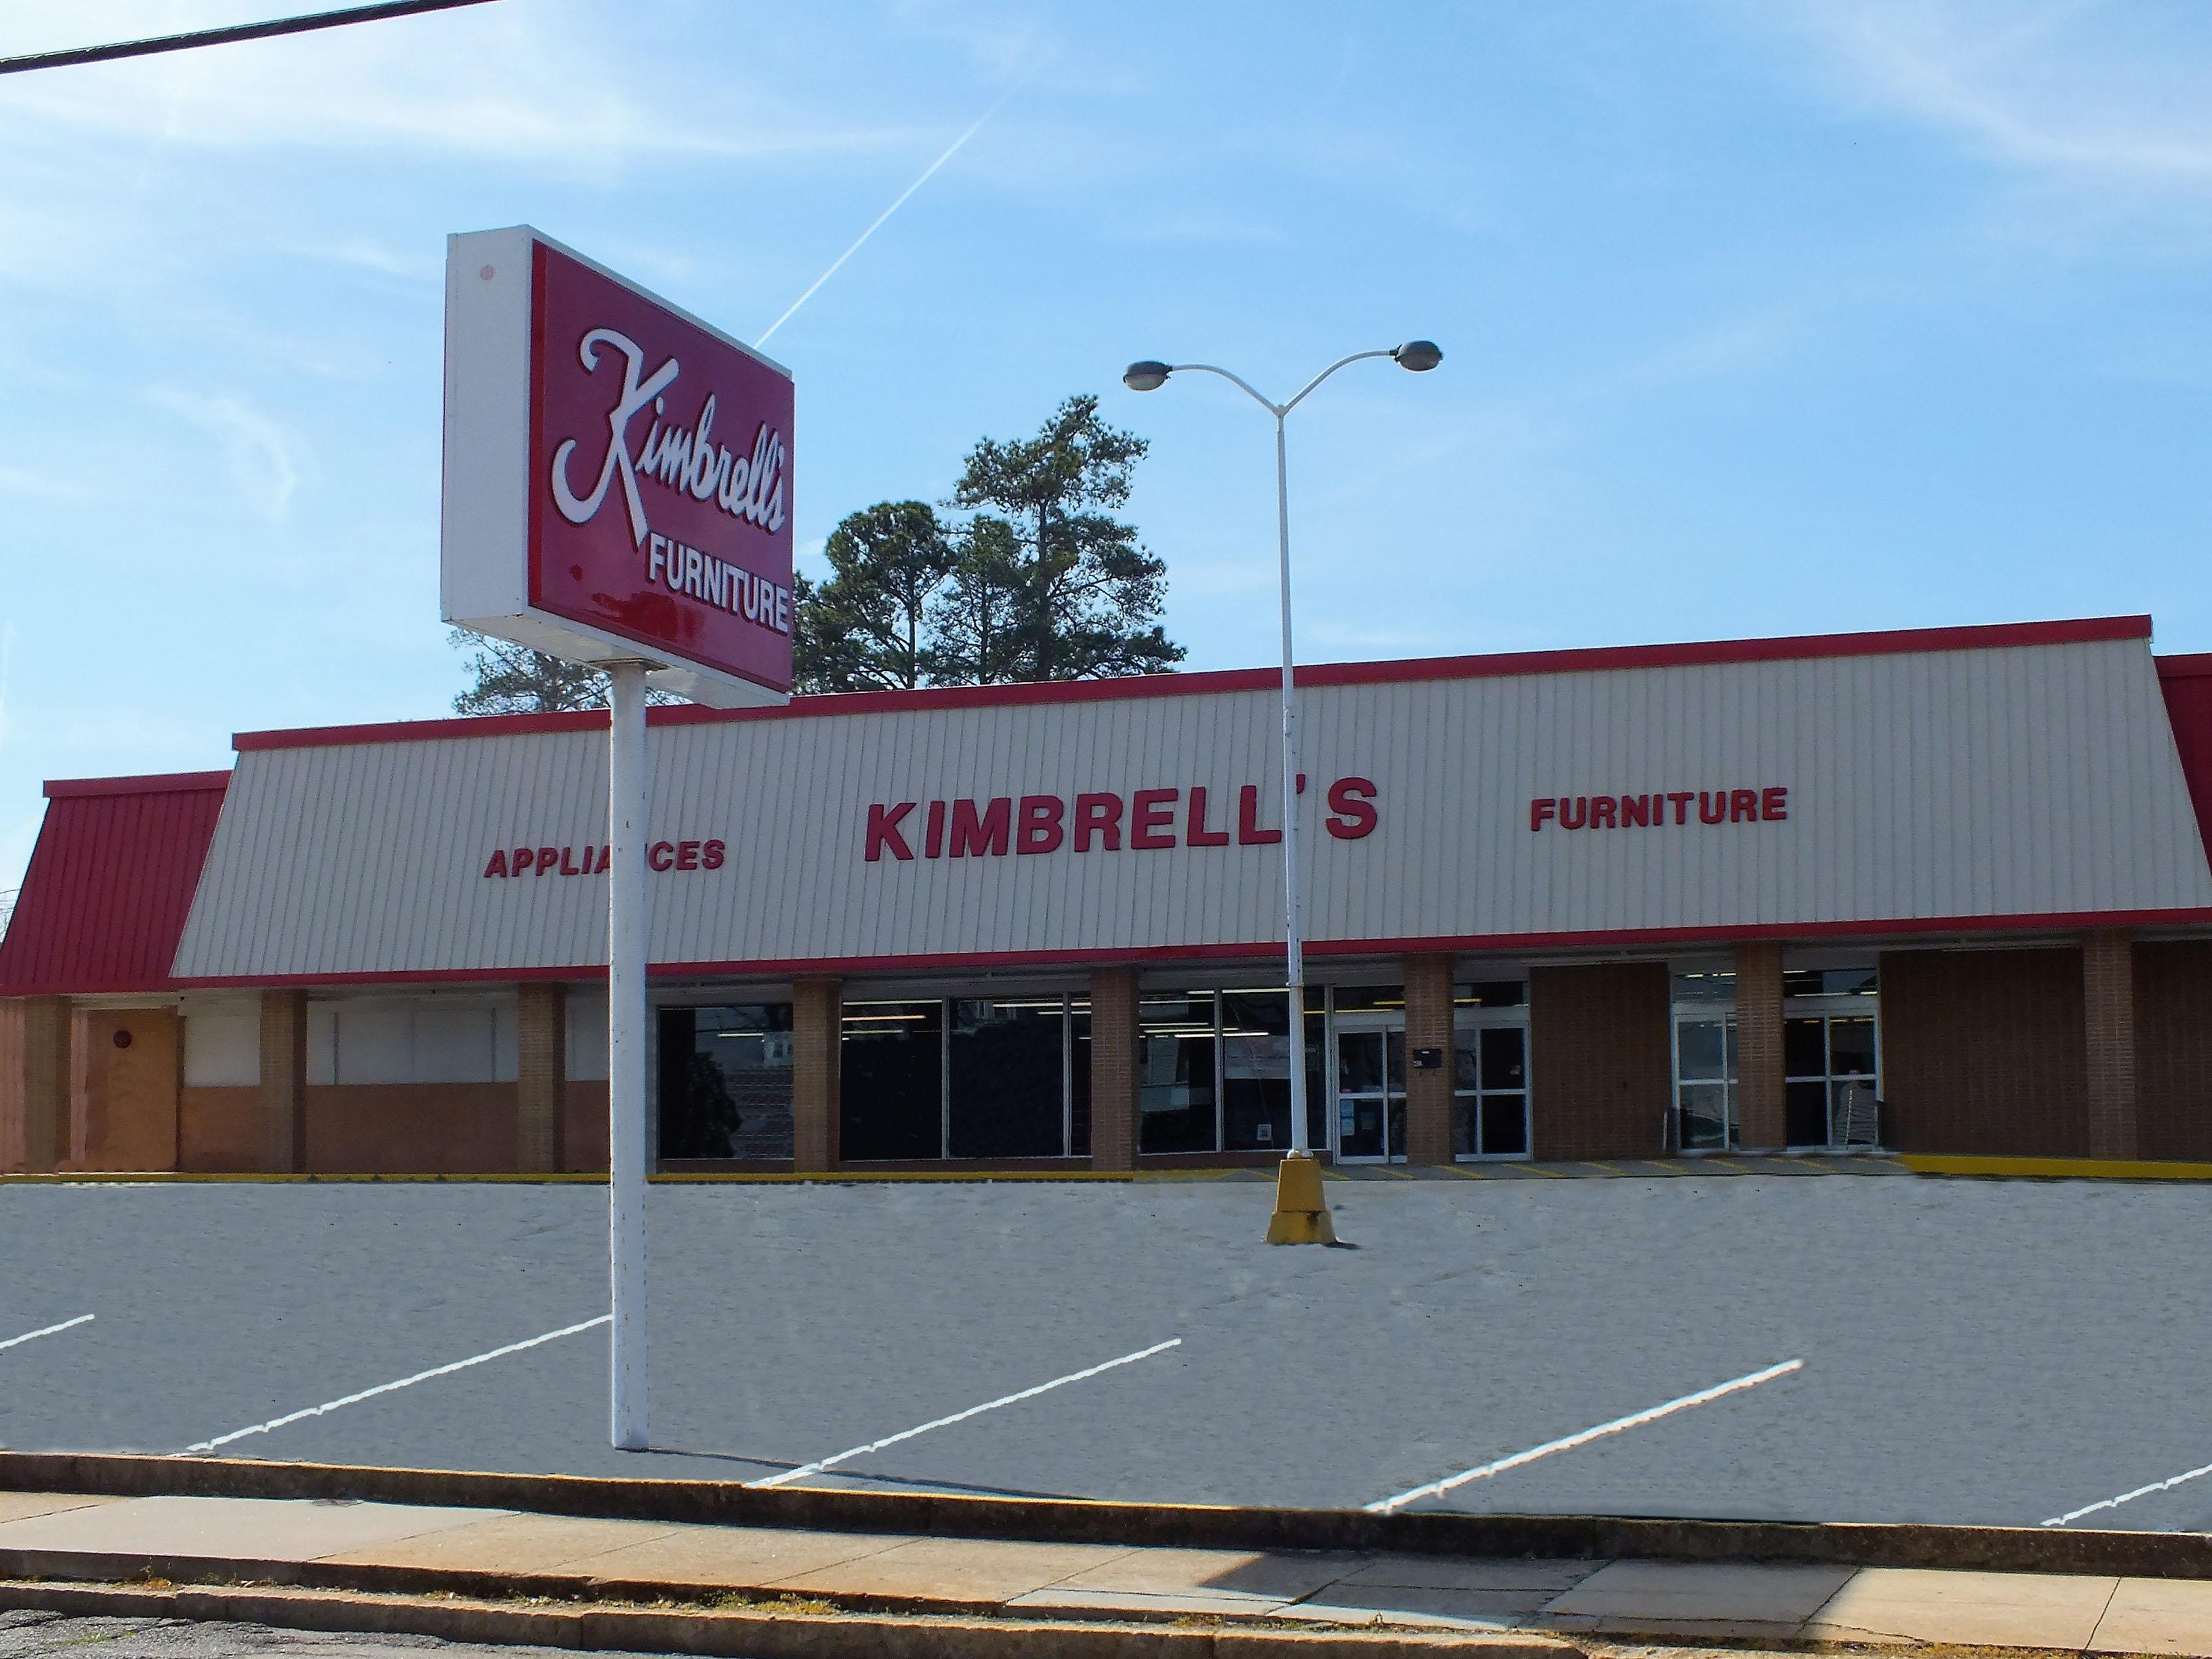 kimbrell 39 s furniture in elberton ga whitepages. Black Bedroom Furniture Sets. Home Design Ideas